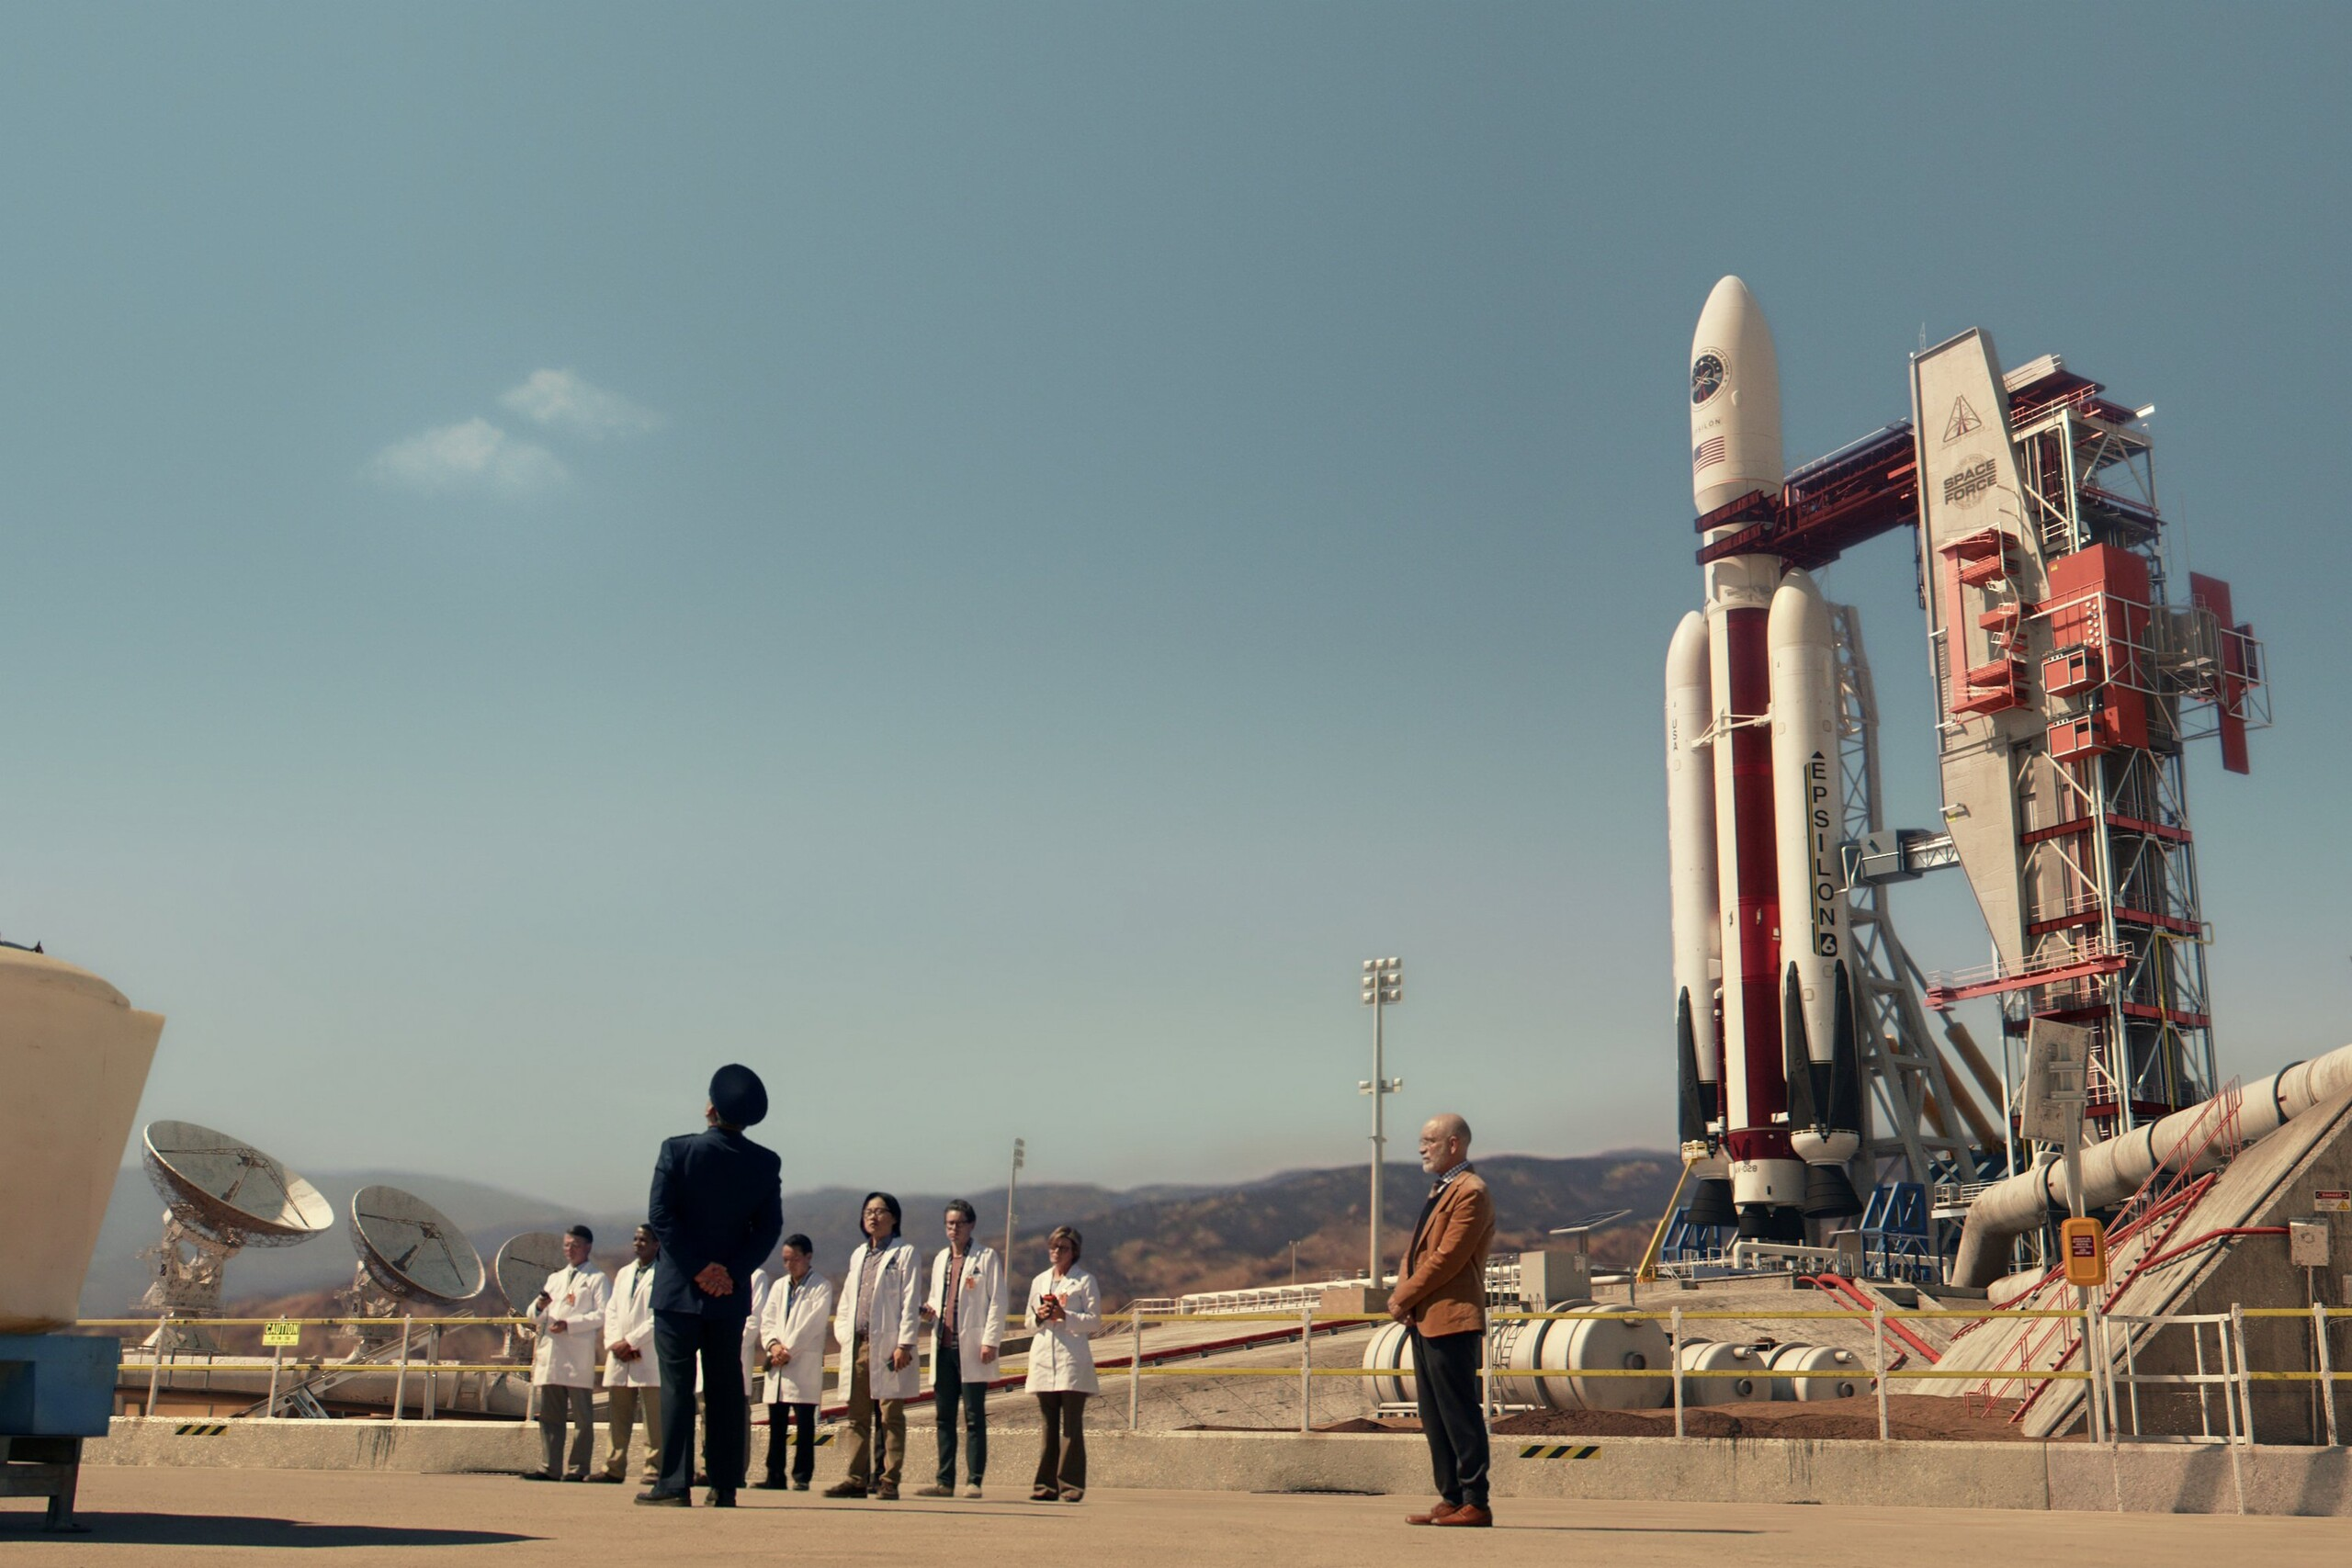 Ракета - гибрид Атлас 5, Титана 4, Фэлкон 9 и ранних версий Ангары в одном флаконе).